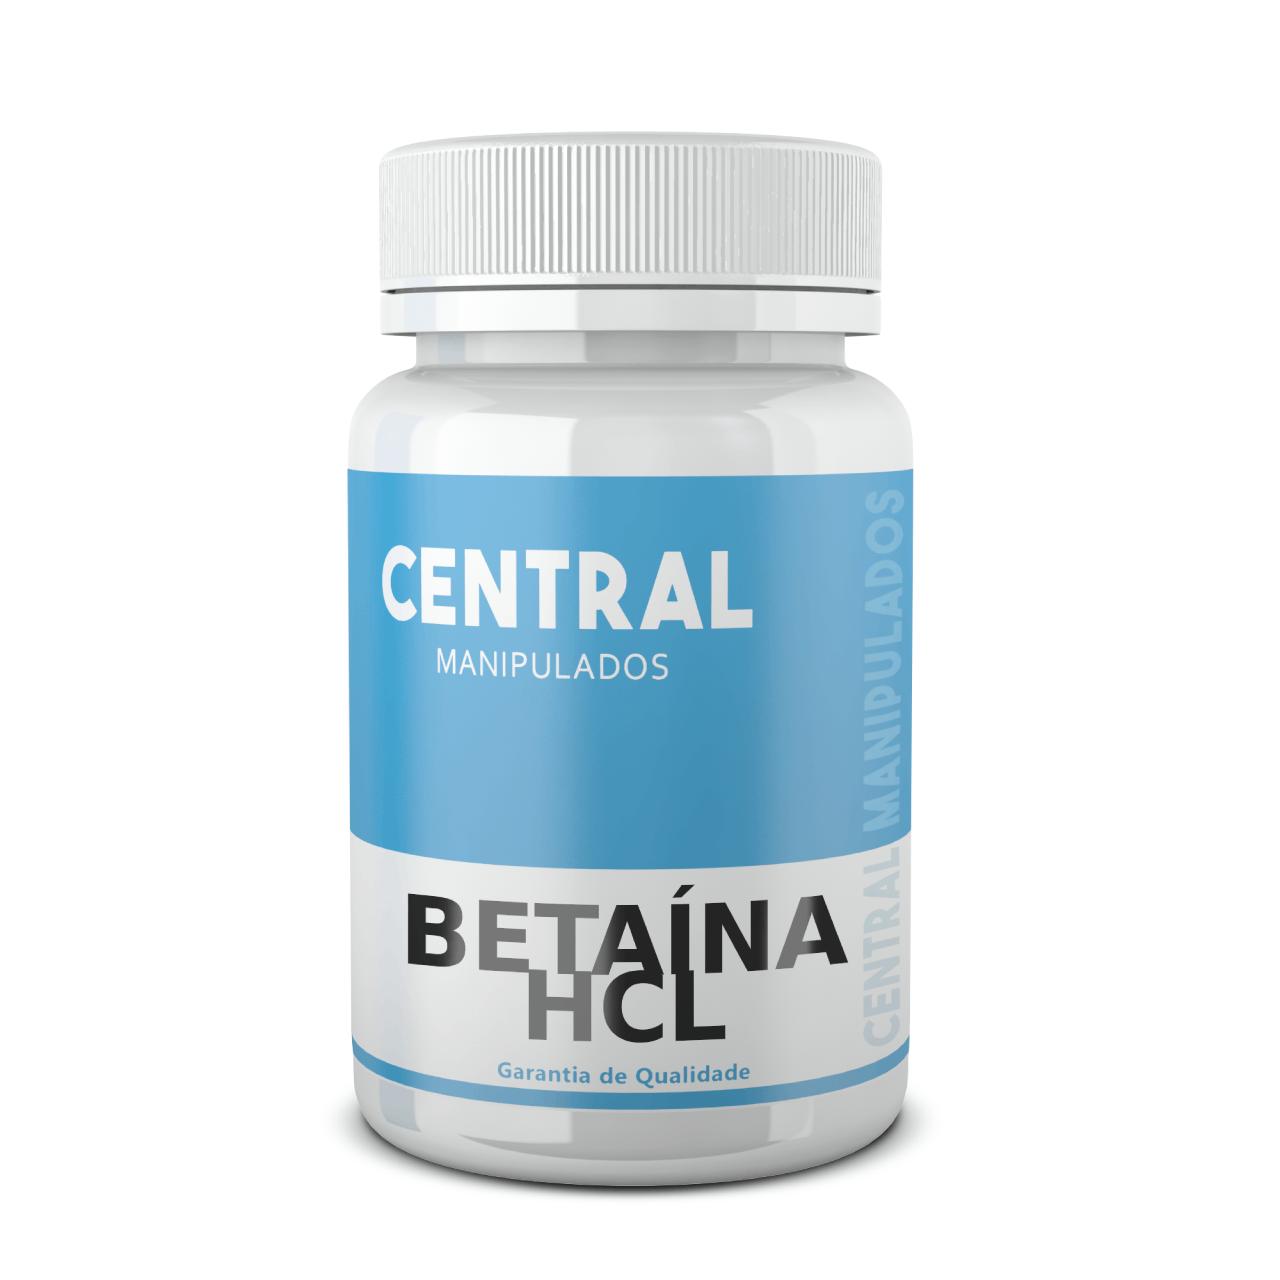 Betaína HCL 300mg - 60 cápsulas